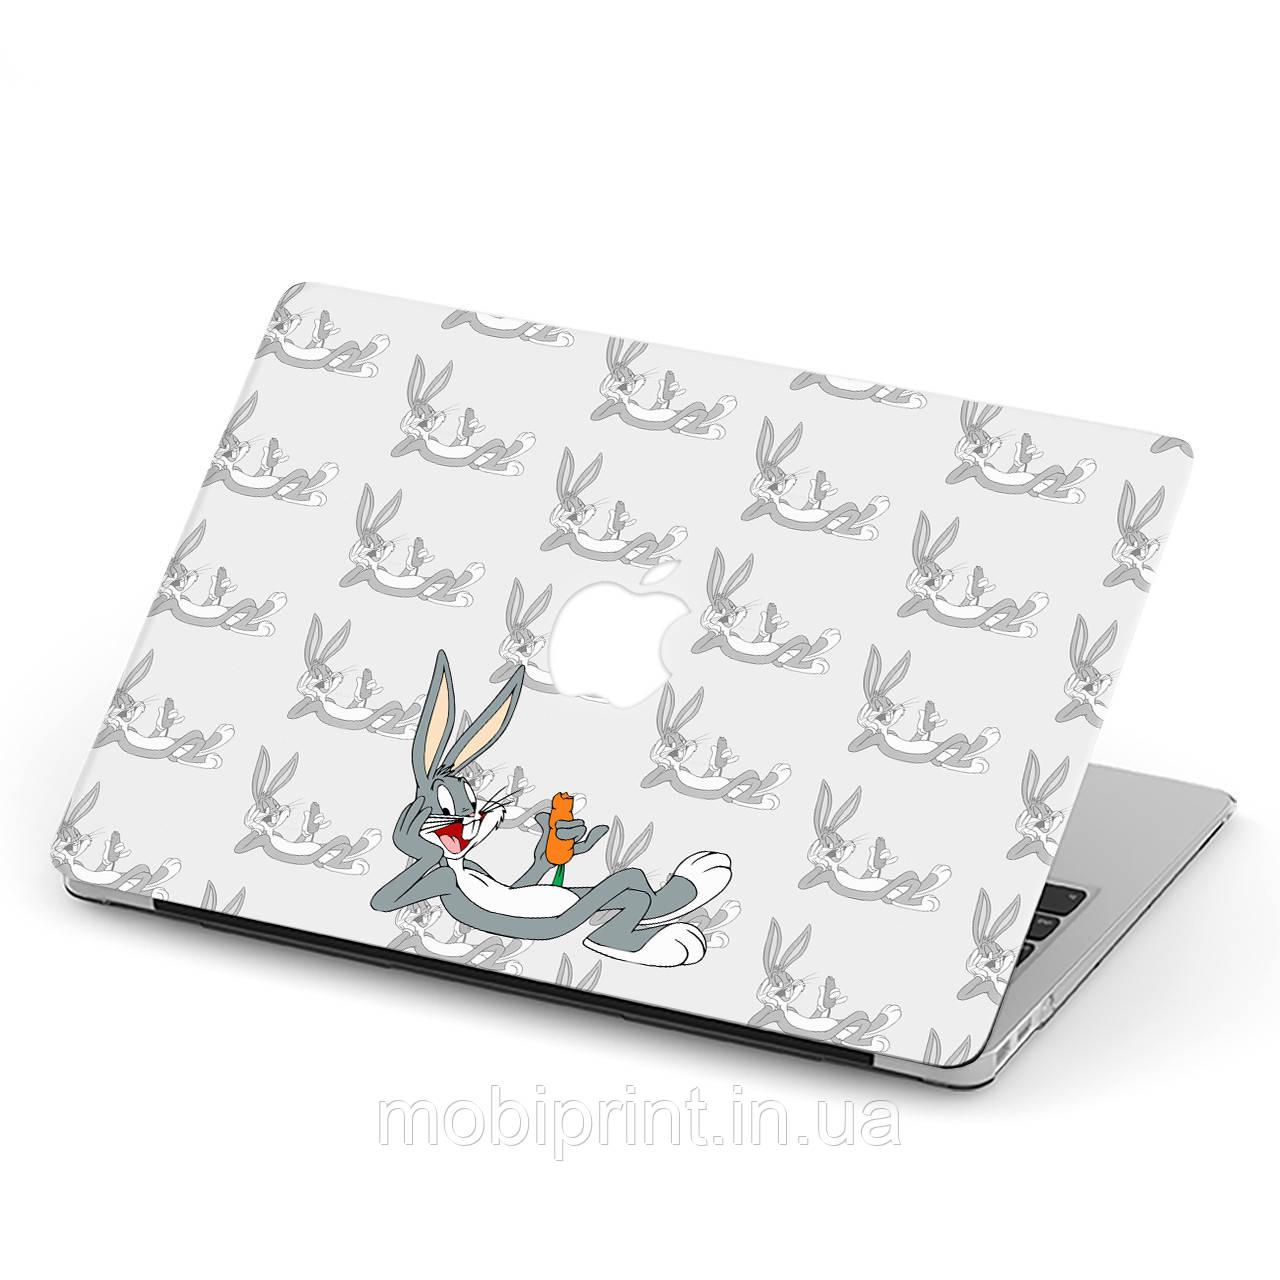 Чехол пластиковый для Apple MacBook Pro / Air Багз Банни (Bugs Bunny) макбук про case hard cover